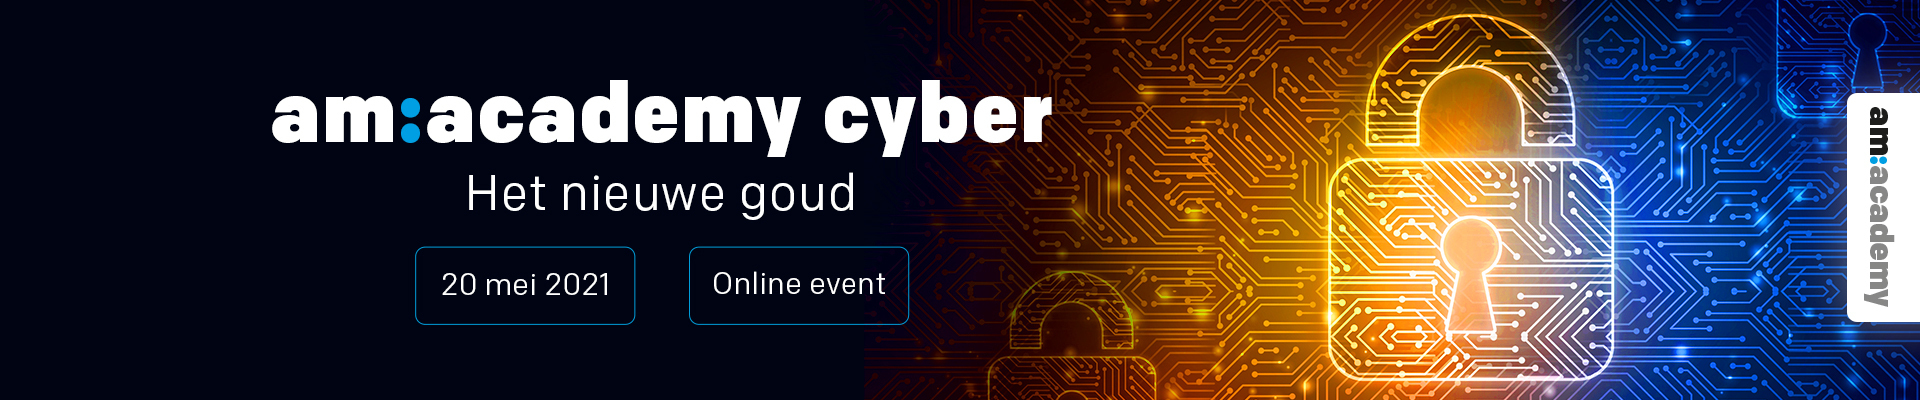 AMacademy Cyber